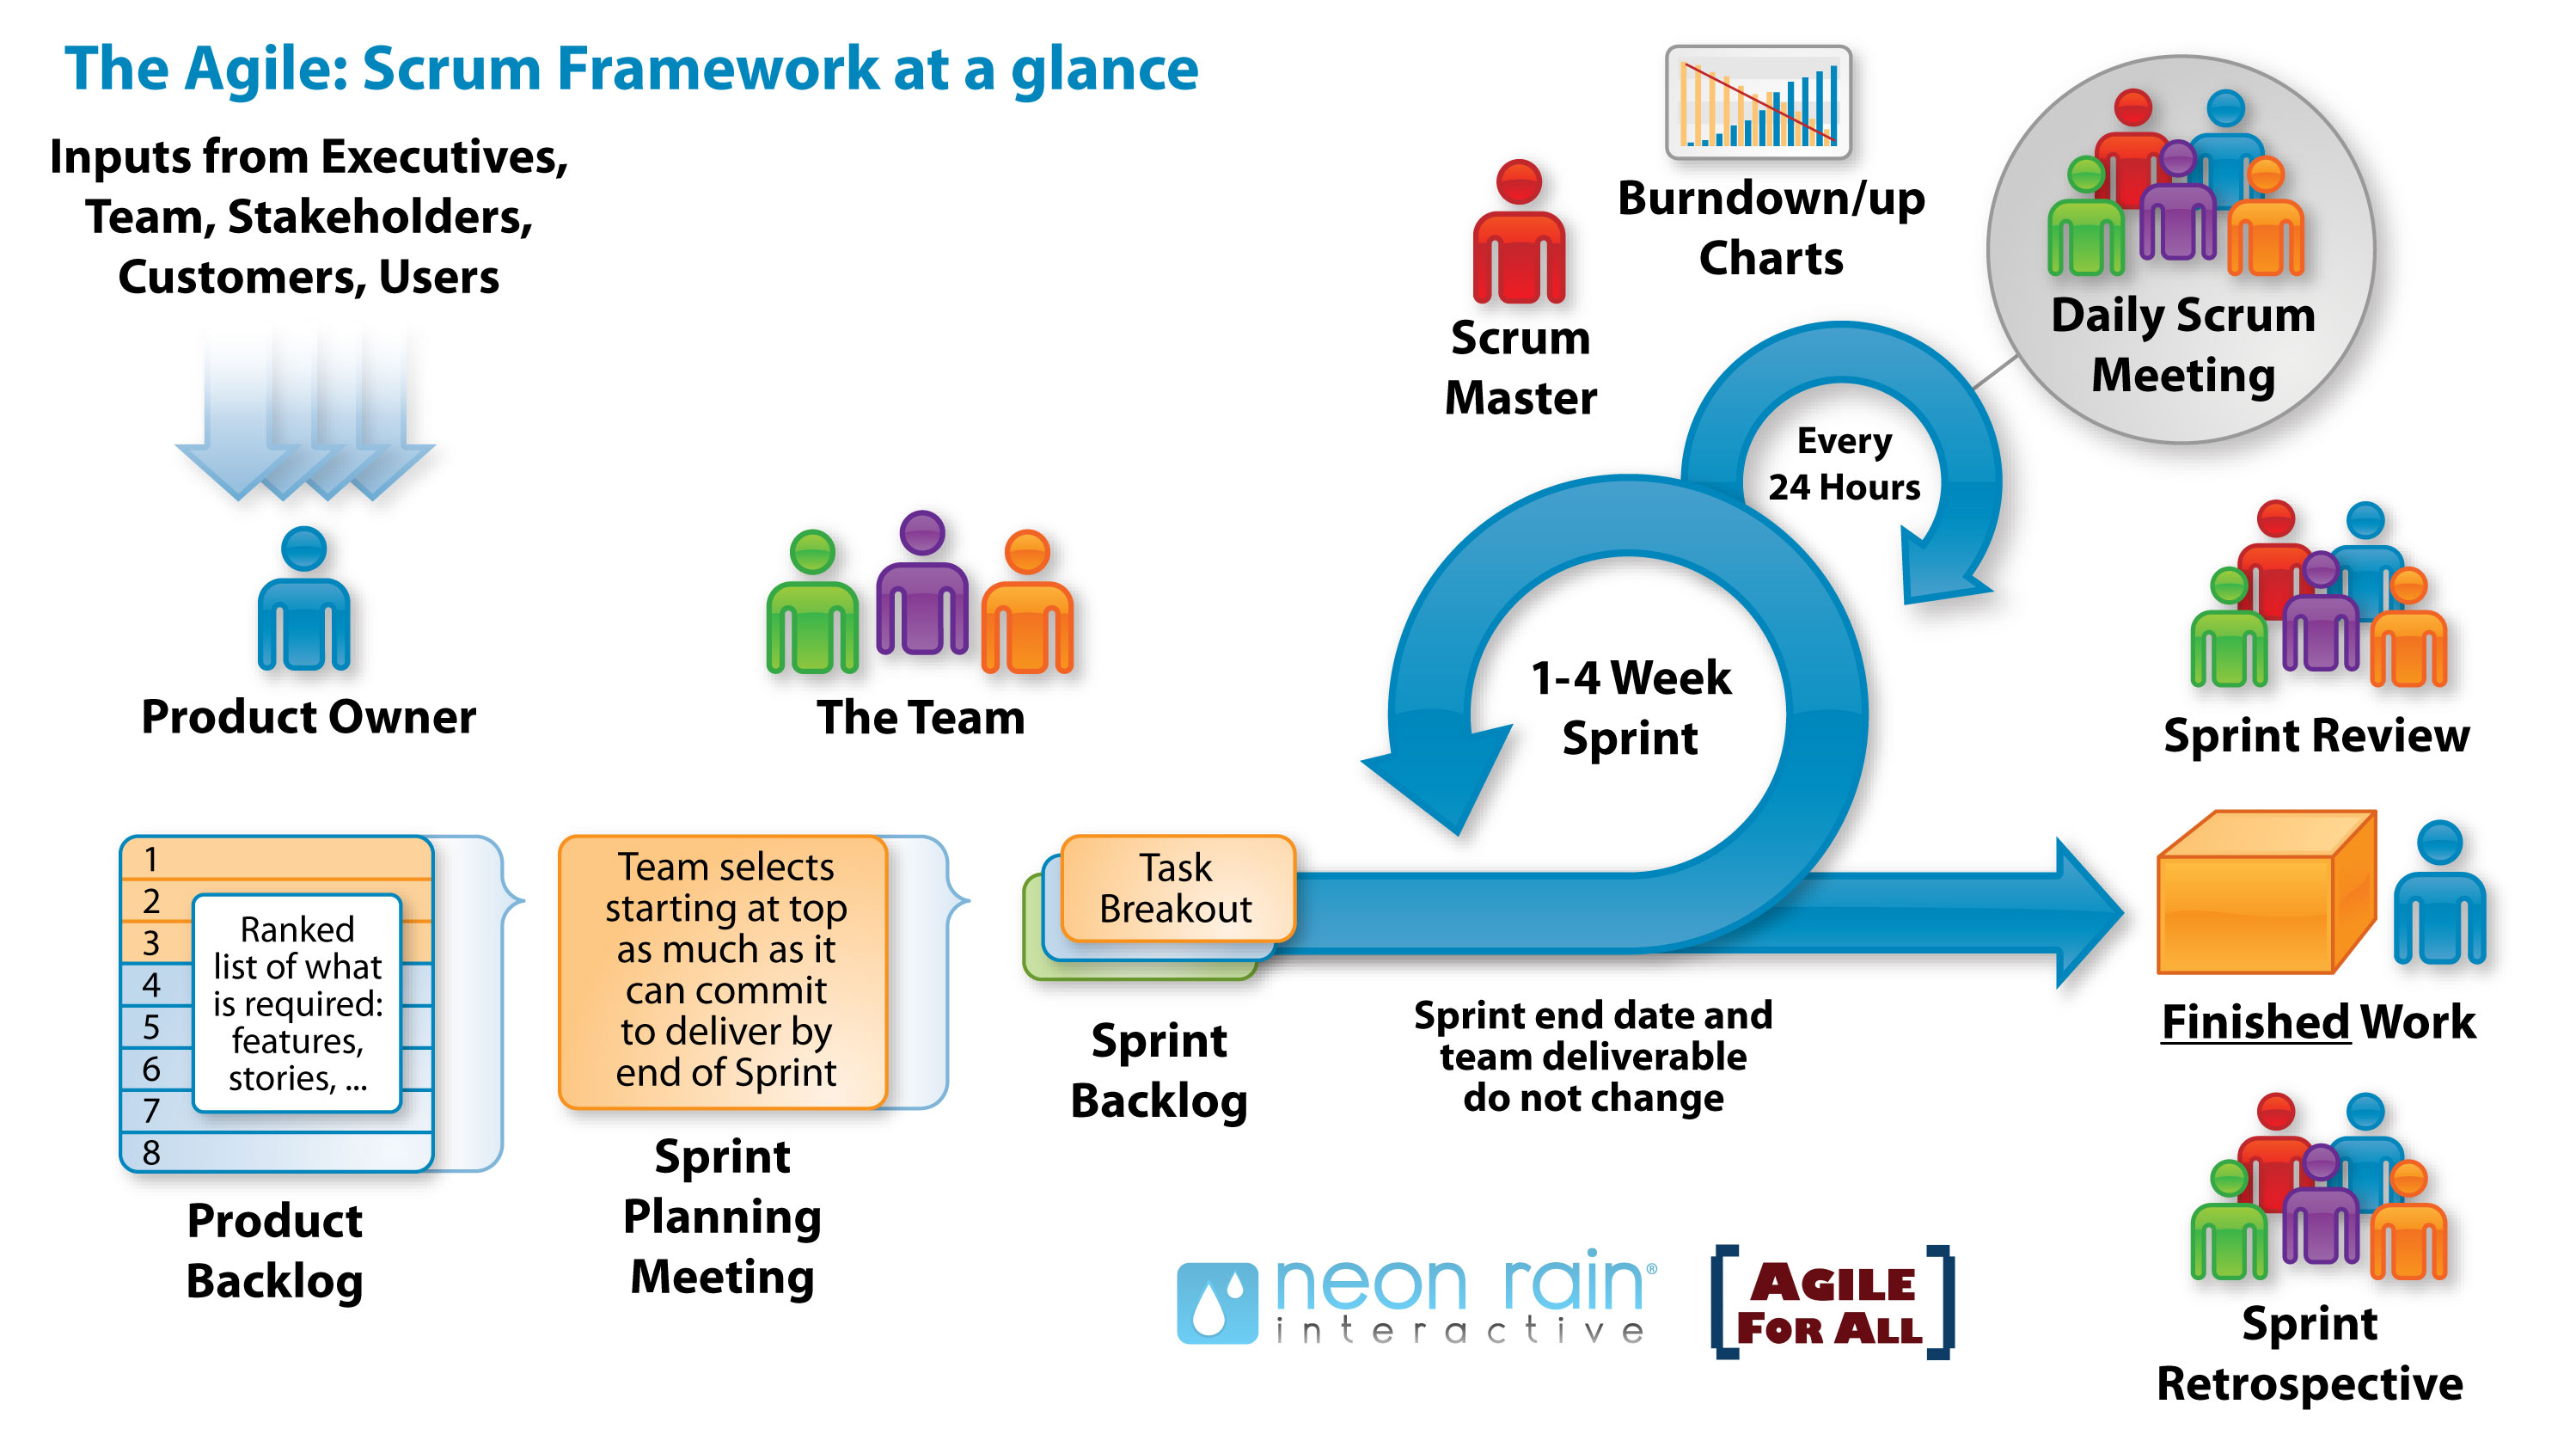 agile process flow diagram wiring for heat pump system methods of software development eternal sunshine